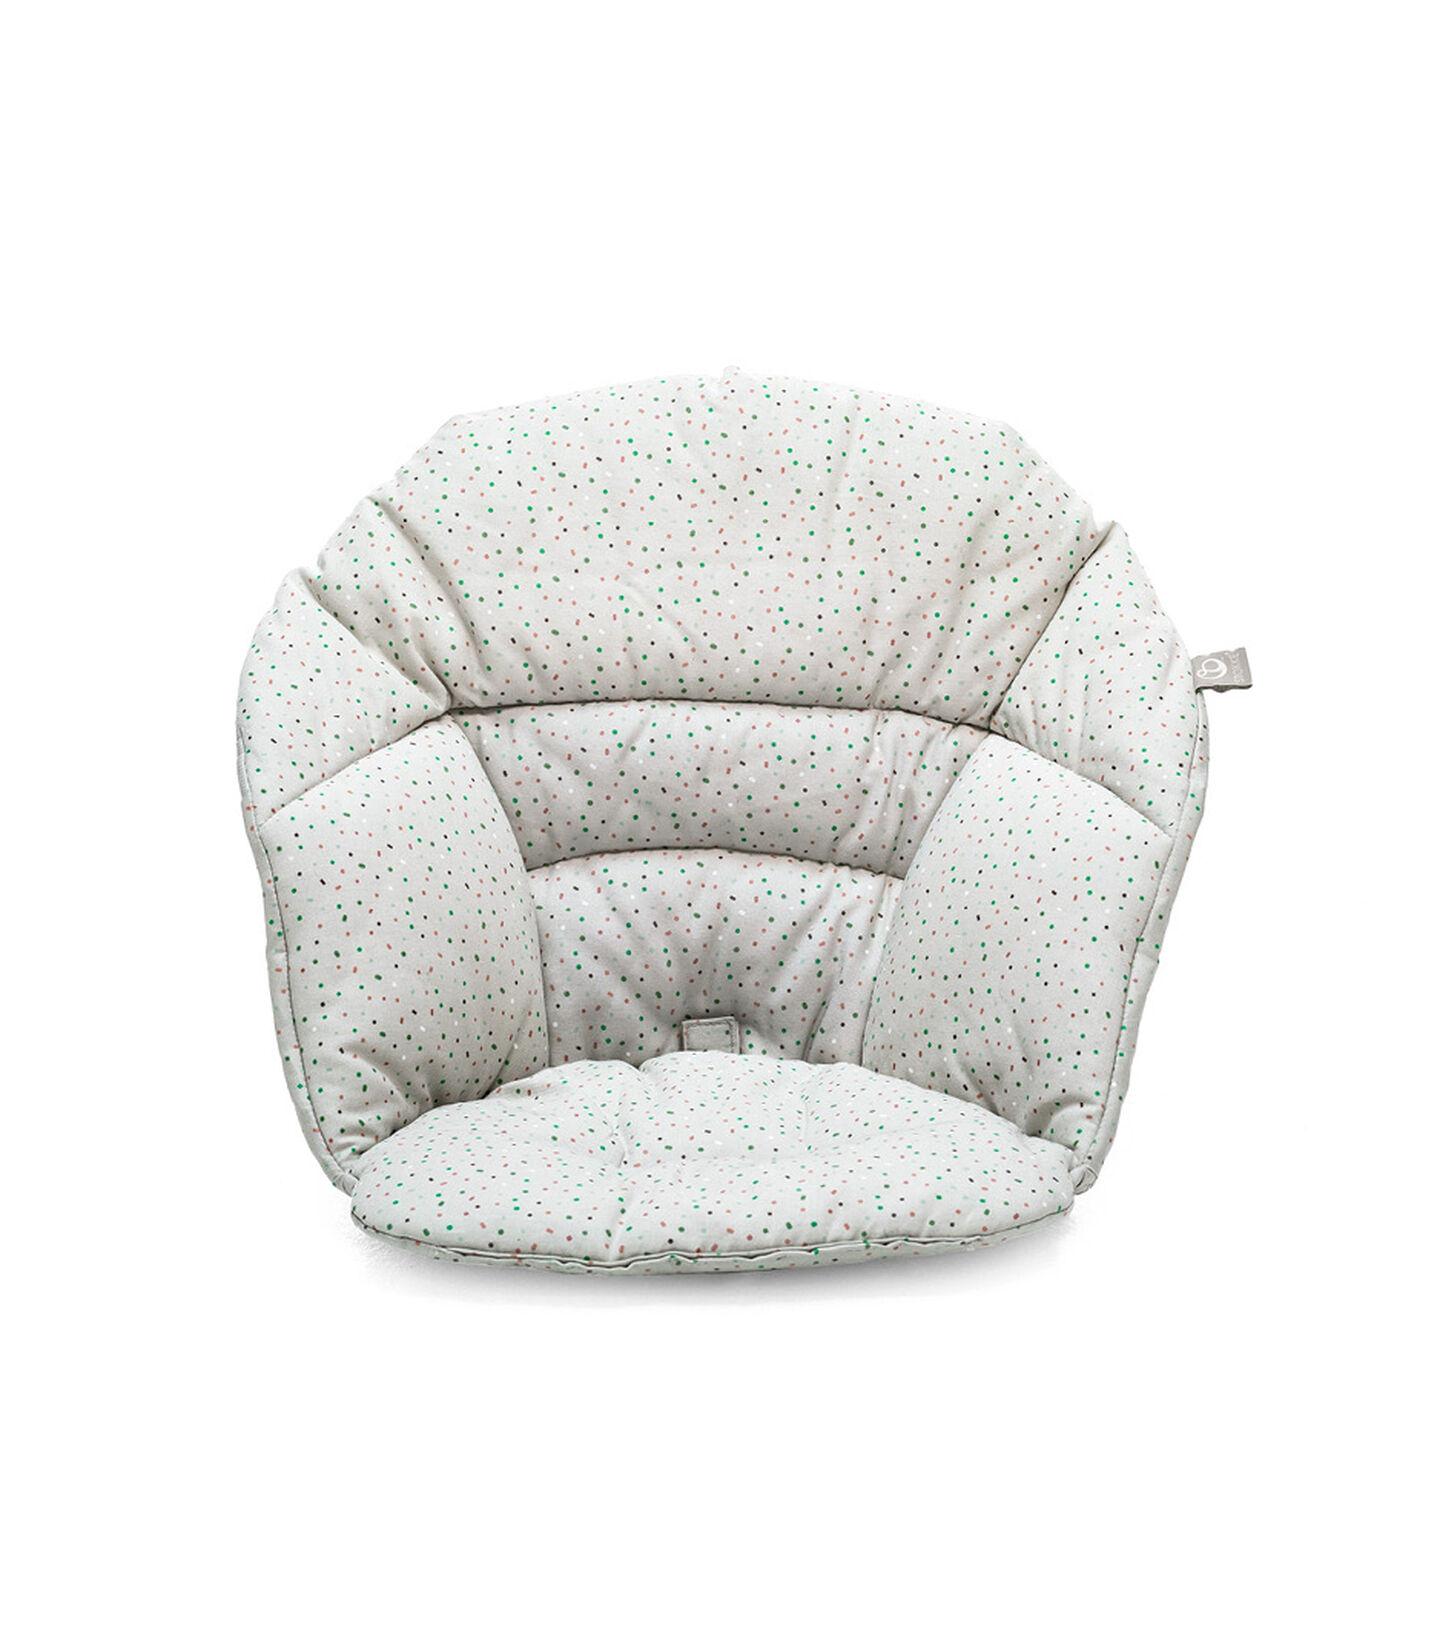 Stokke® Clikk™ Cushion Grey Sprinkles OCS, Grey Sprinkles, mainview view 2